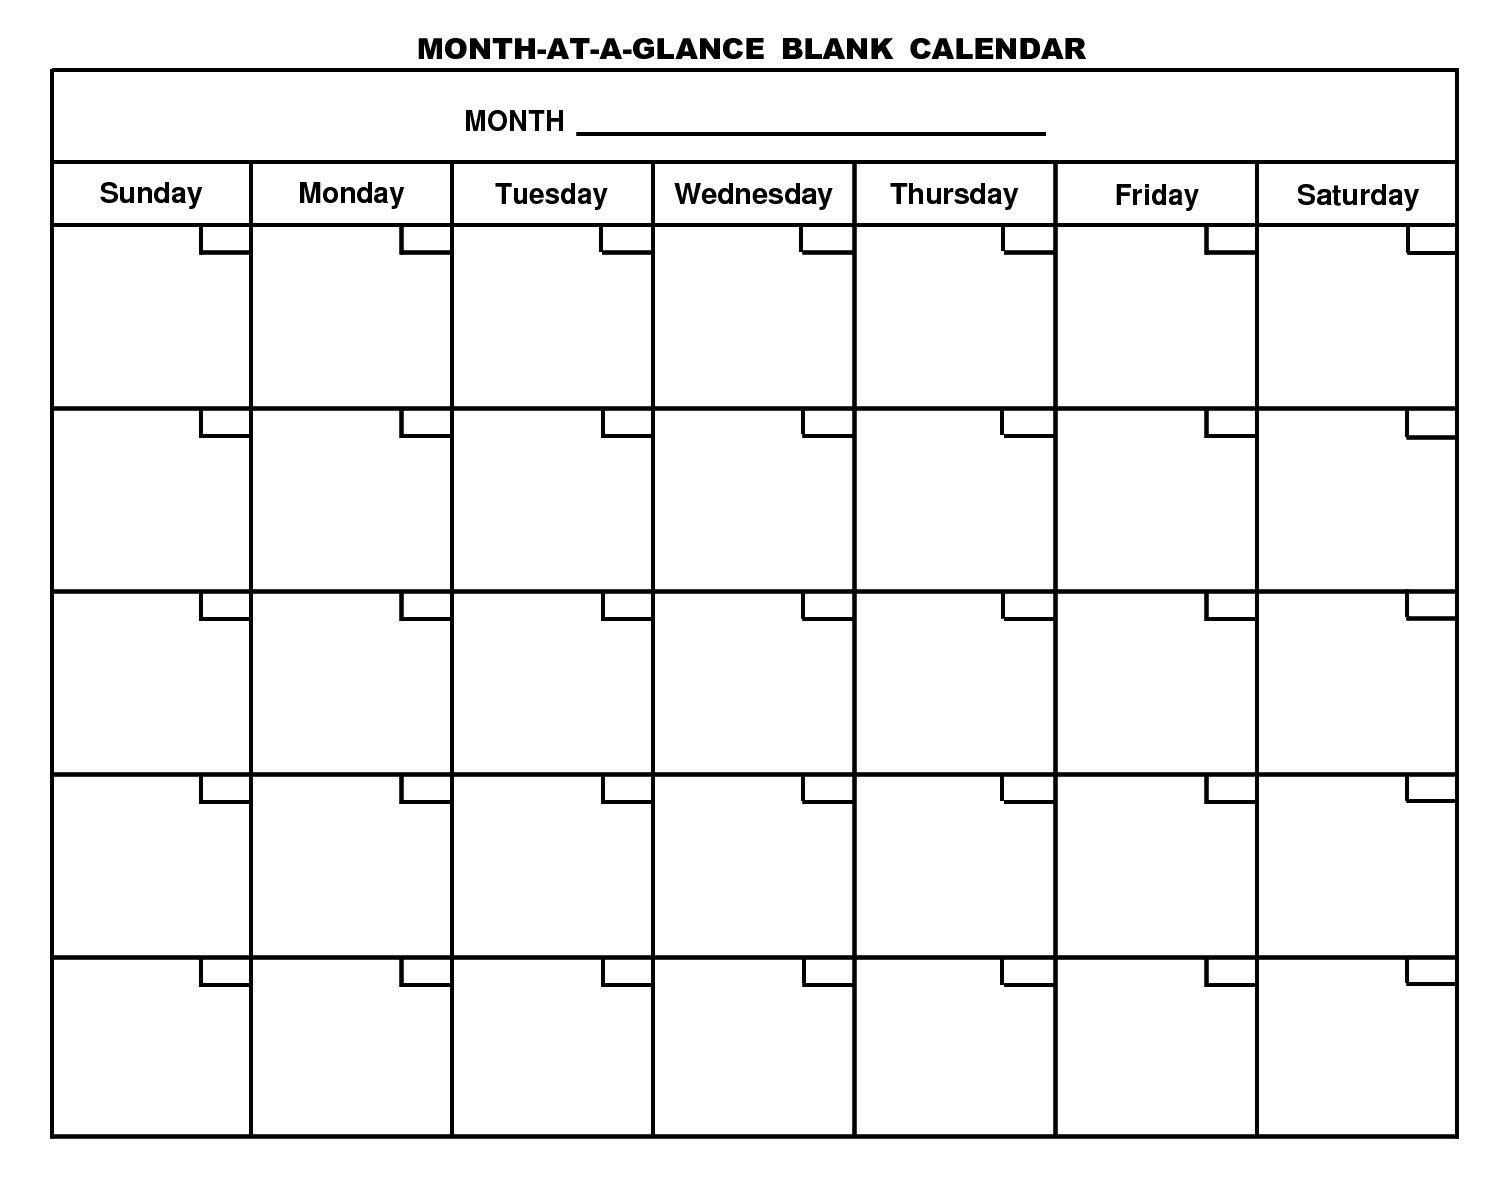 Weekly Calendar Wallpaper : Printable calendar hd wallpapers download free